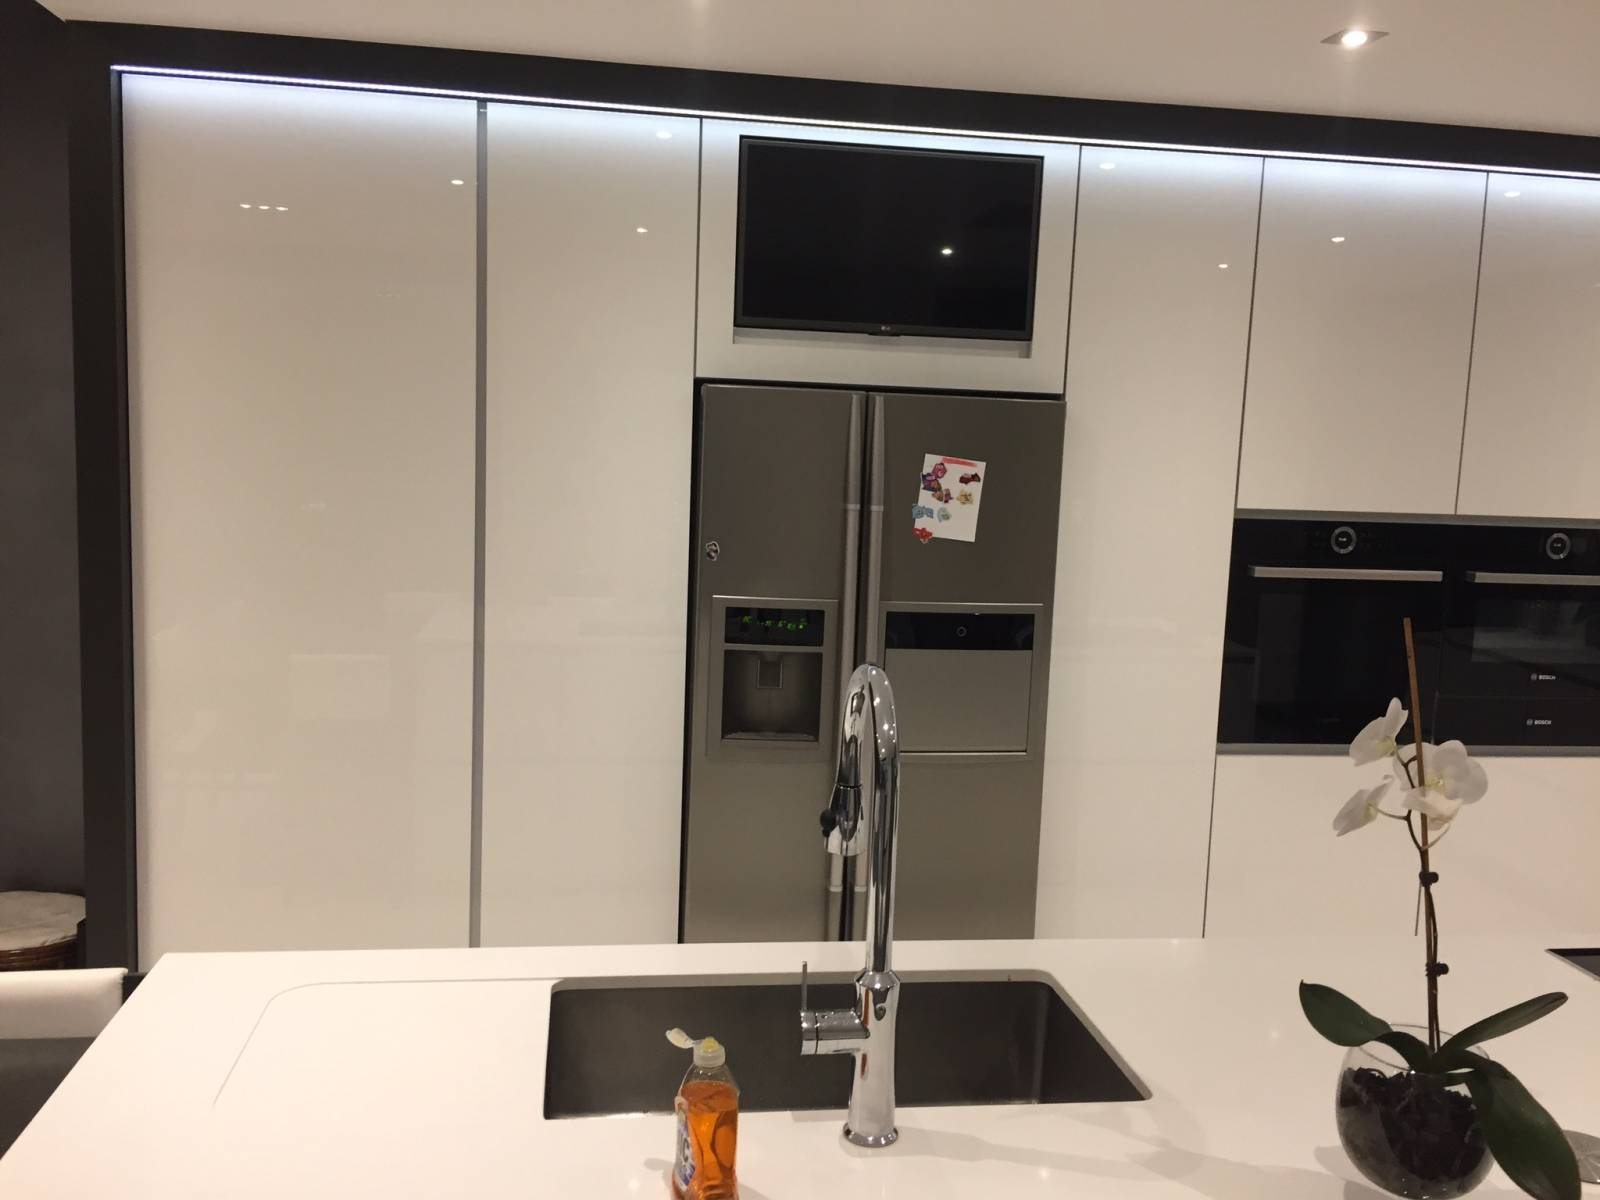 cuisine cachee blanche haute brillance a vienne is re vente et installation de po le. Black Bedroom Furniture Sets. Home Design Ideas